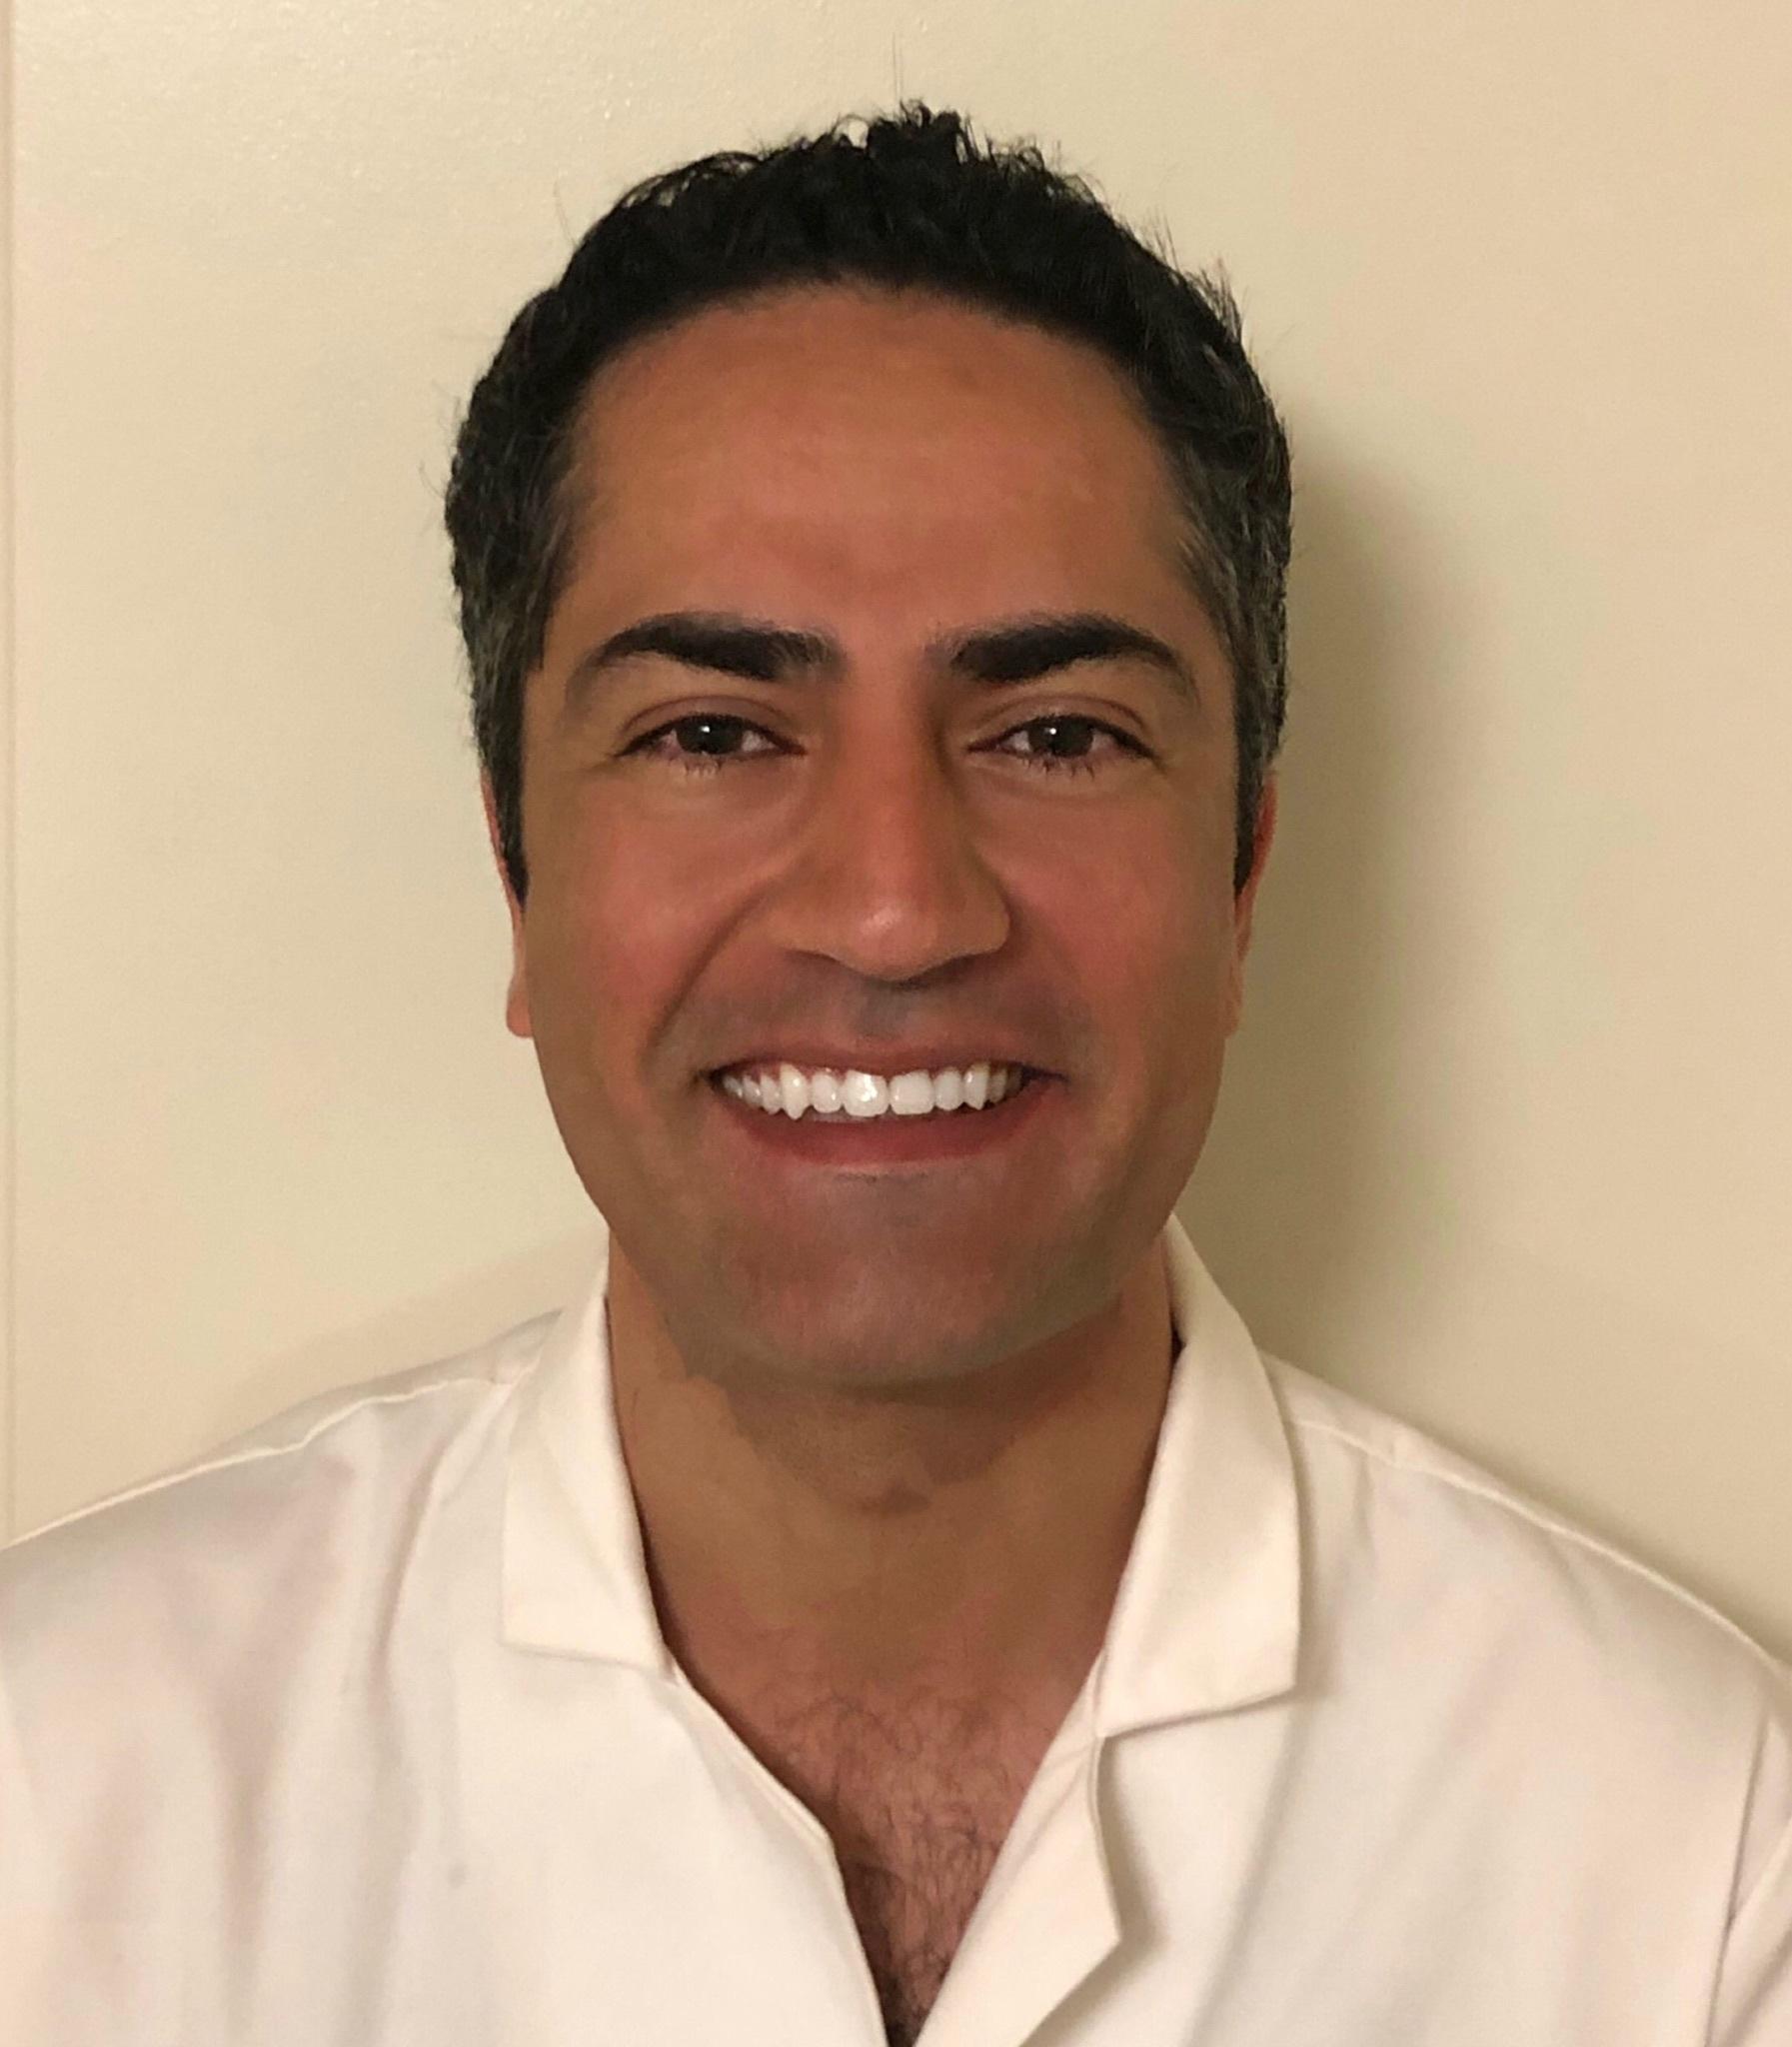 Dr. Amir Aryaan